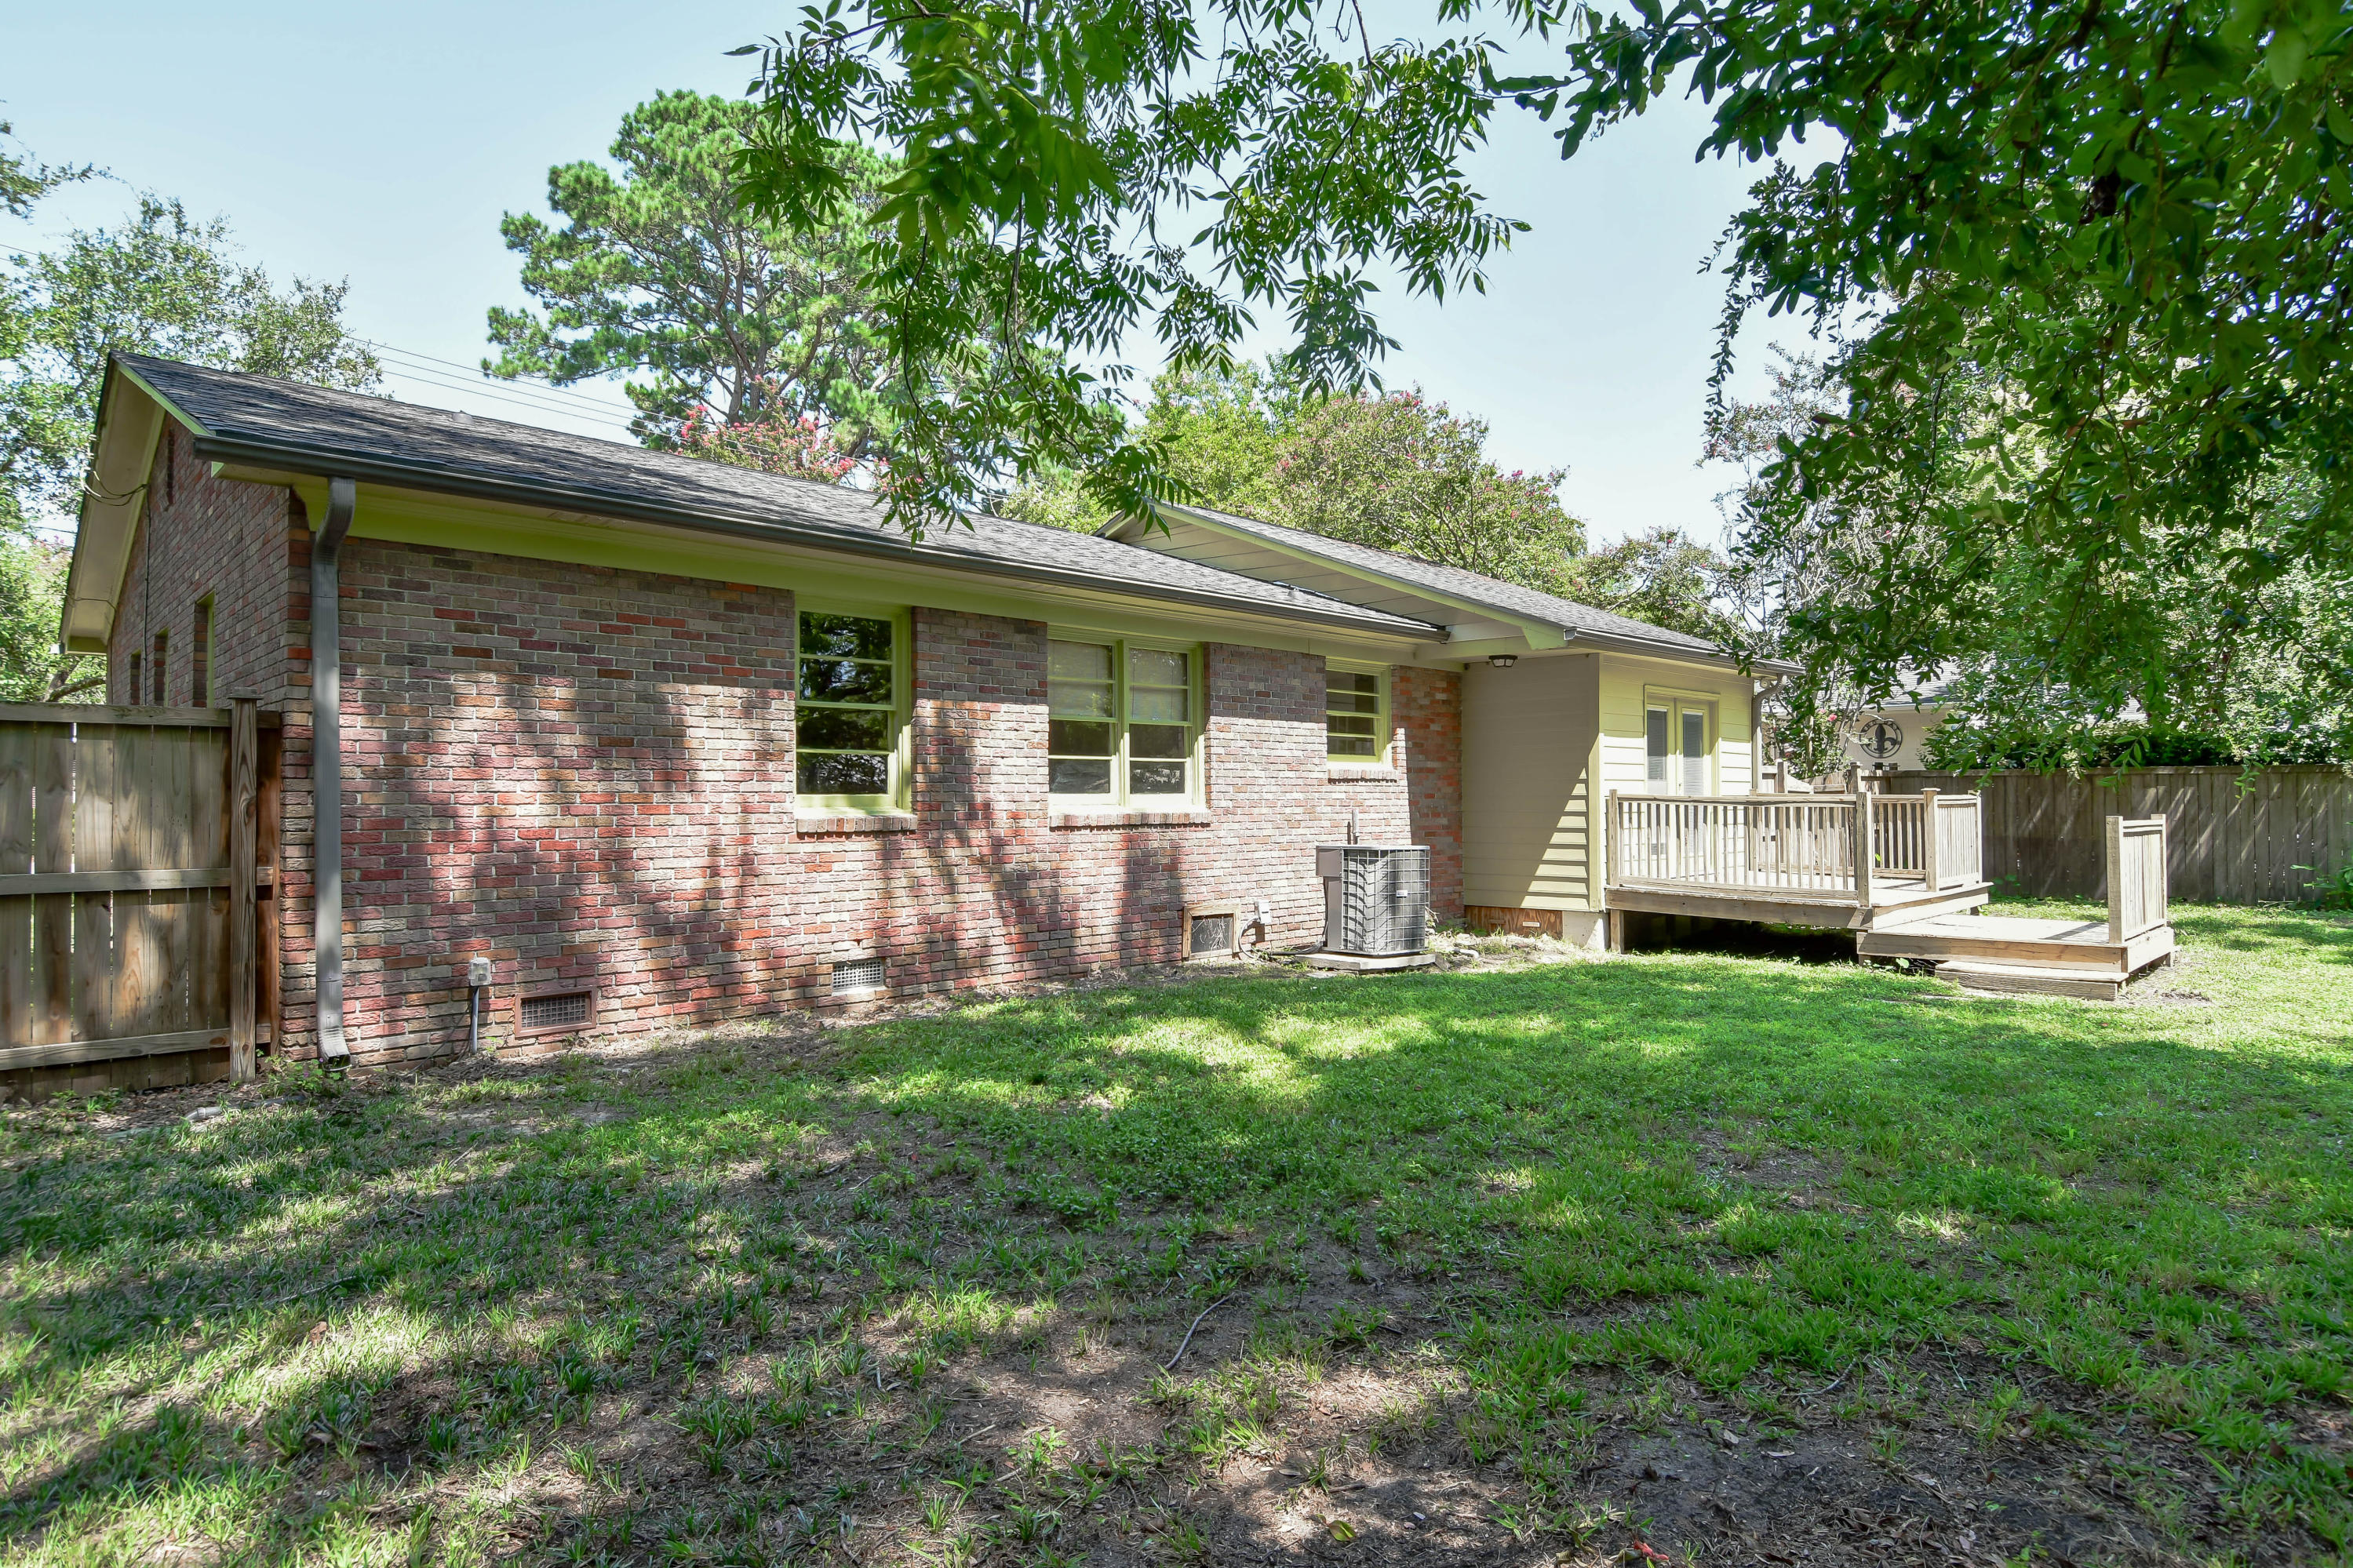 Jasper Terrace Homes For Sale - 1407 Hindman, Mount Pleasant, SC - 1